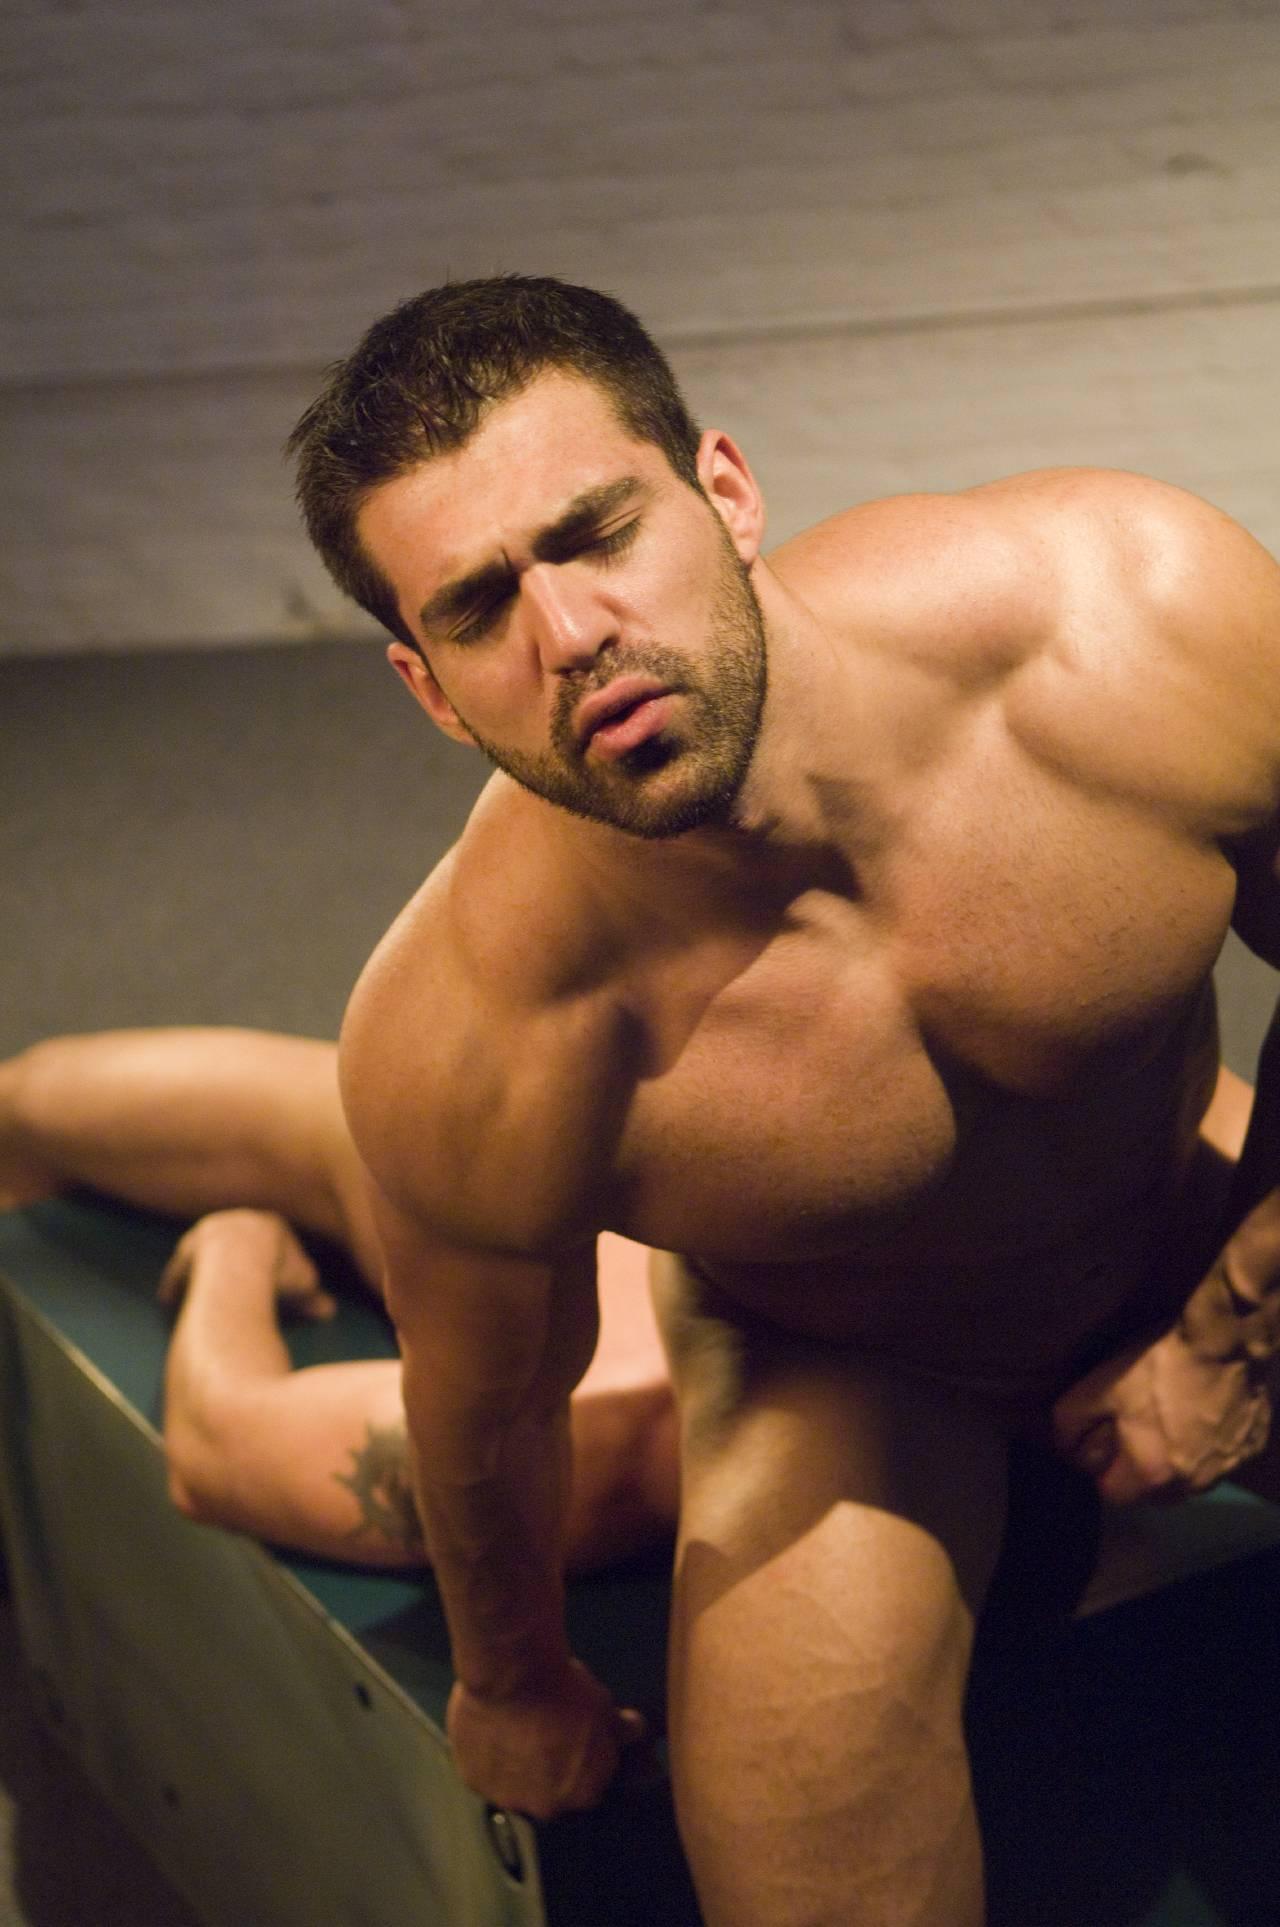 Sportsman gay sucking cock porn